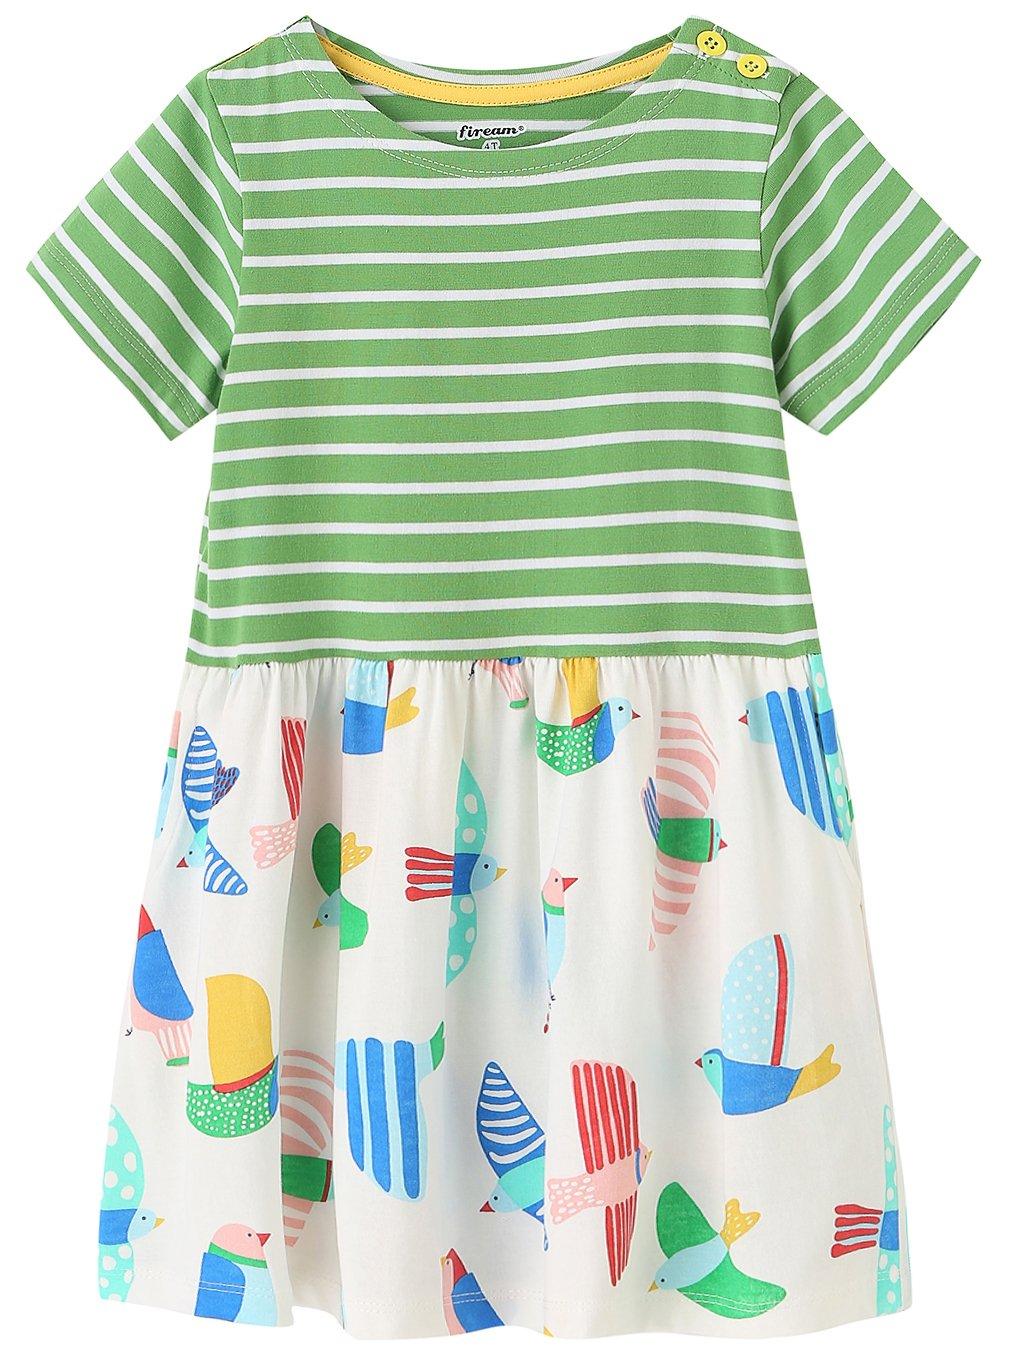 Fiream Girls Dresses,Short Sleeve Summer Cotton Striped Cute Print Pattern Casual Dress for Toddler(154Green,3T/3-4YRS)